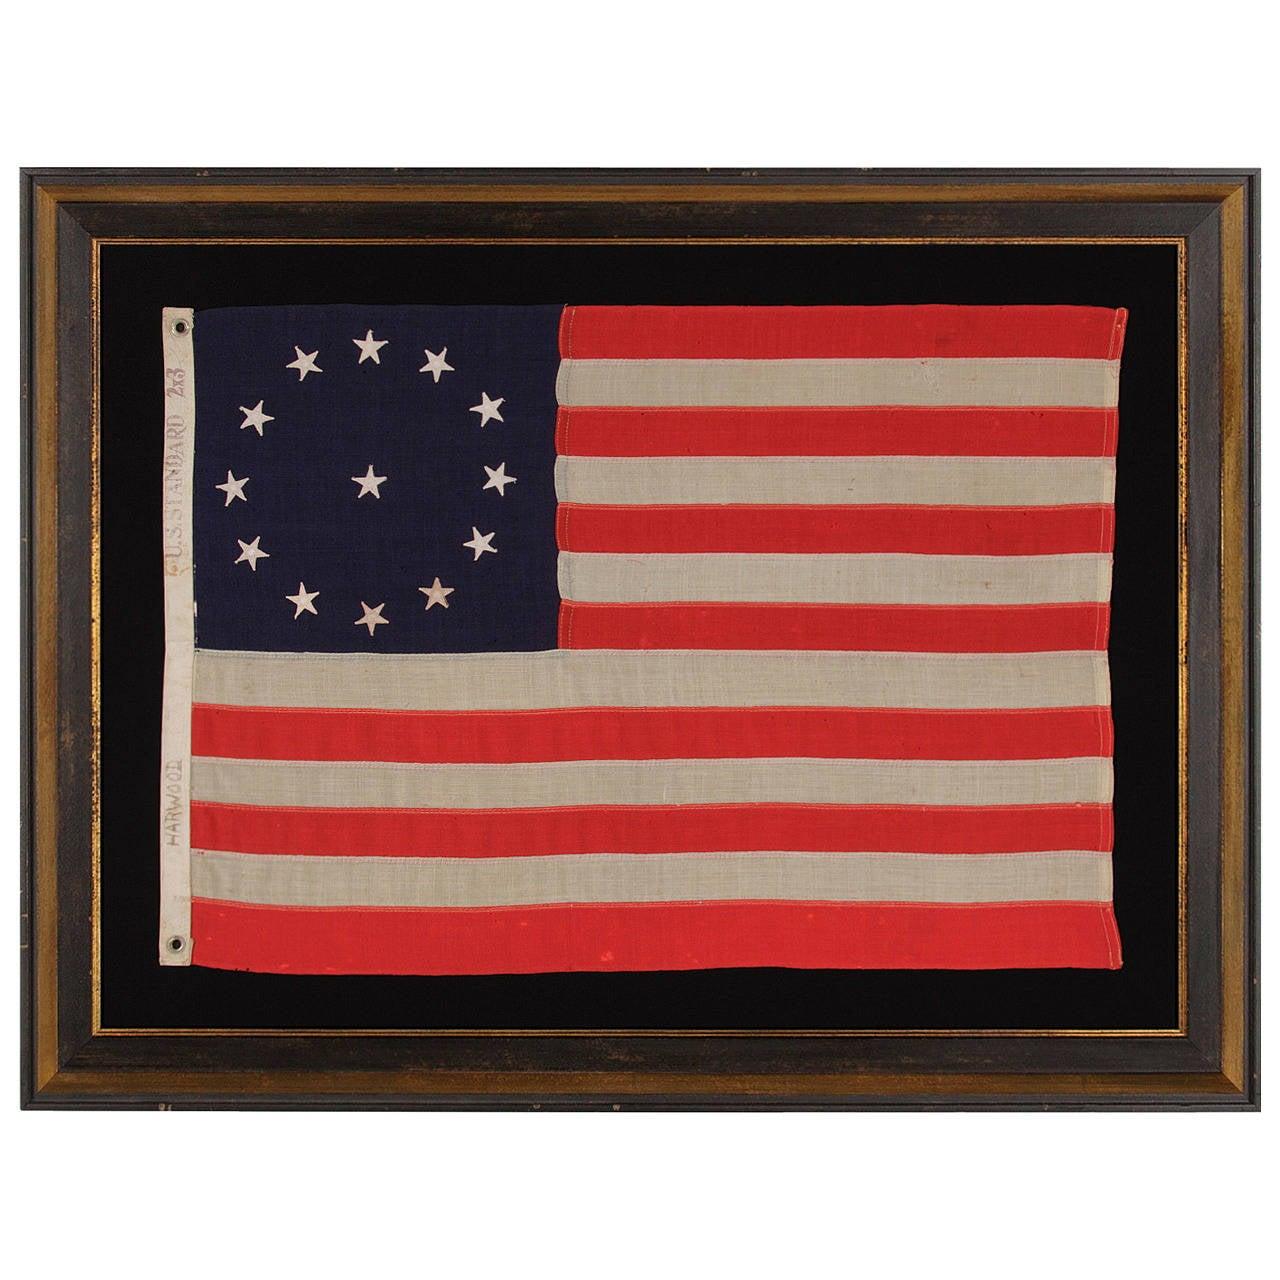 13 Star Third Maryland Pattern Flag